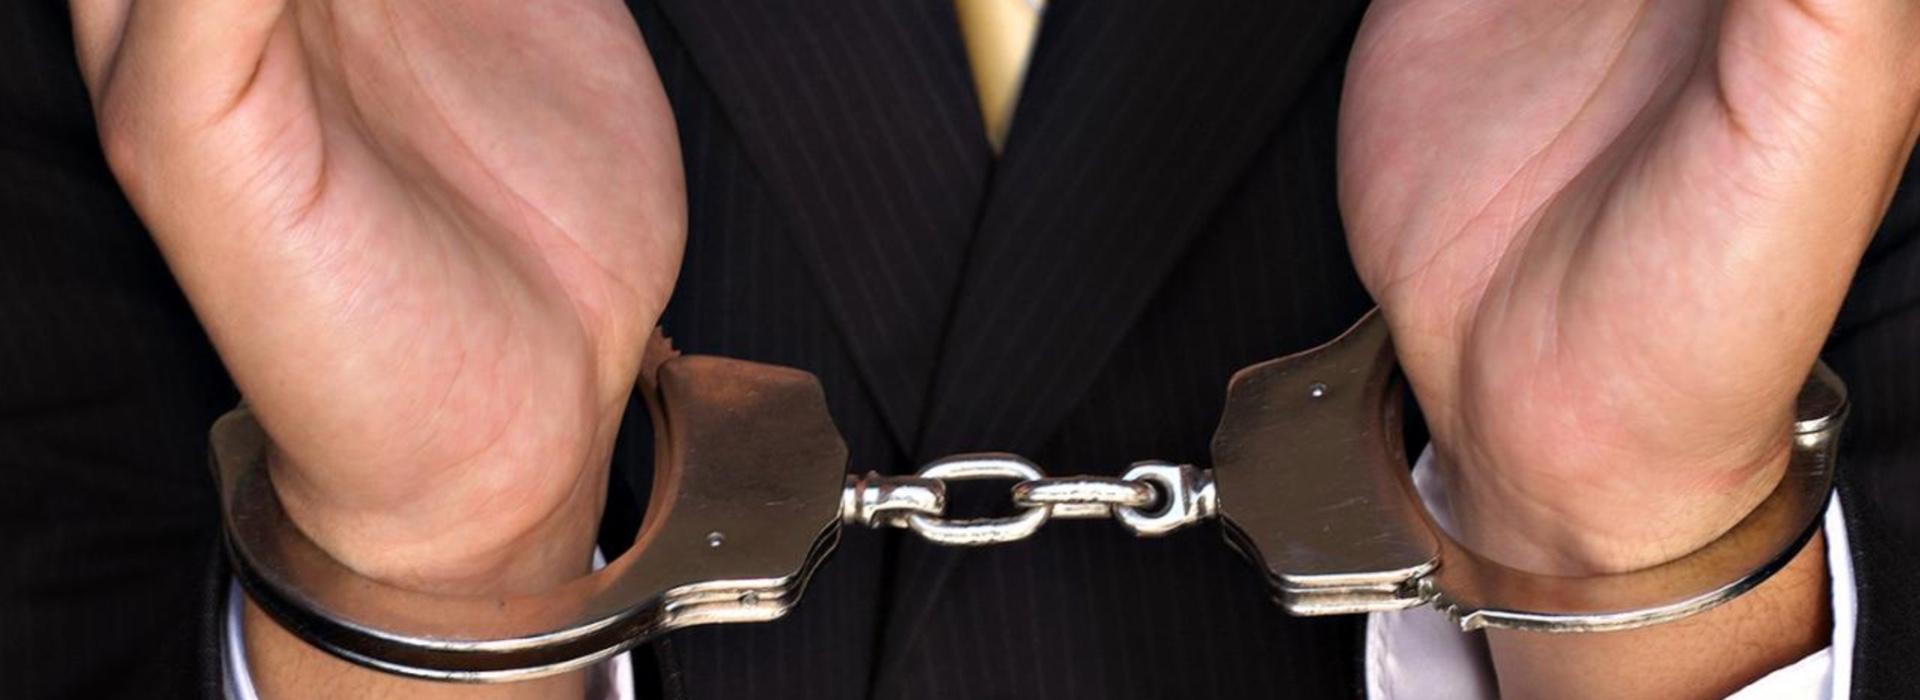 Anti-Bribery-700